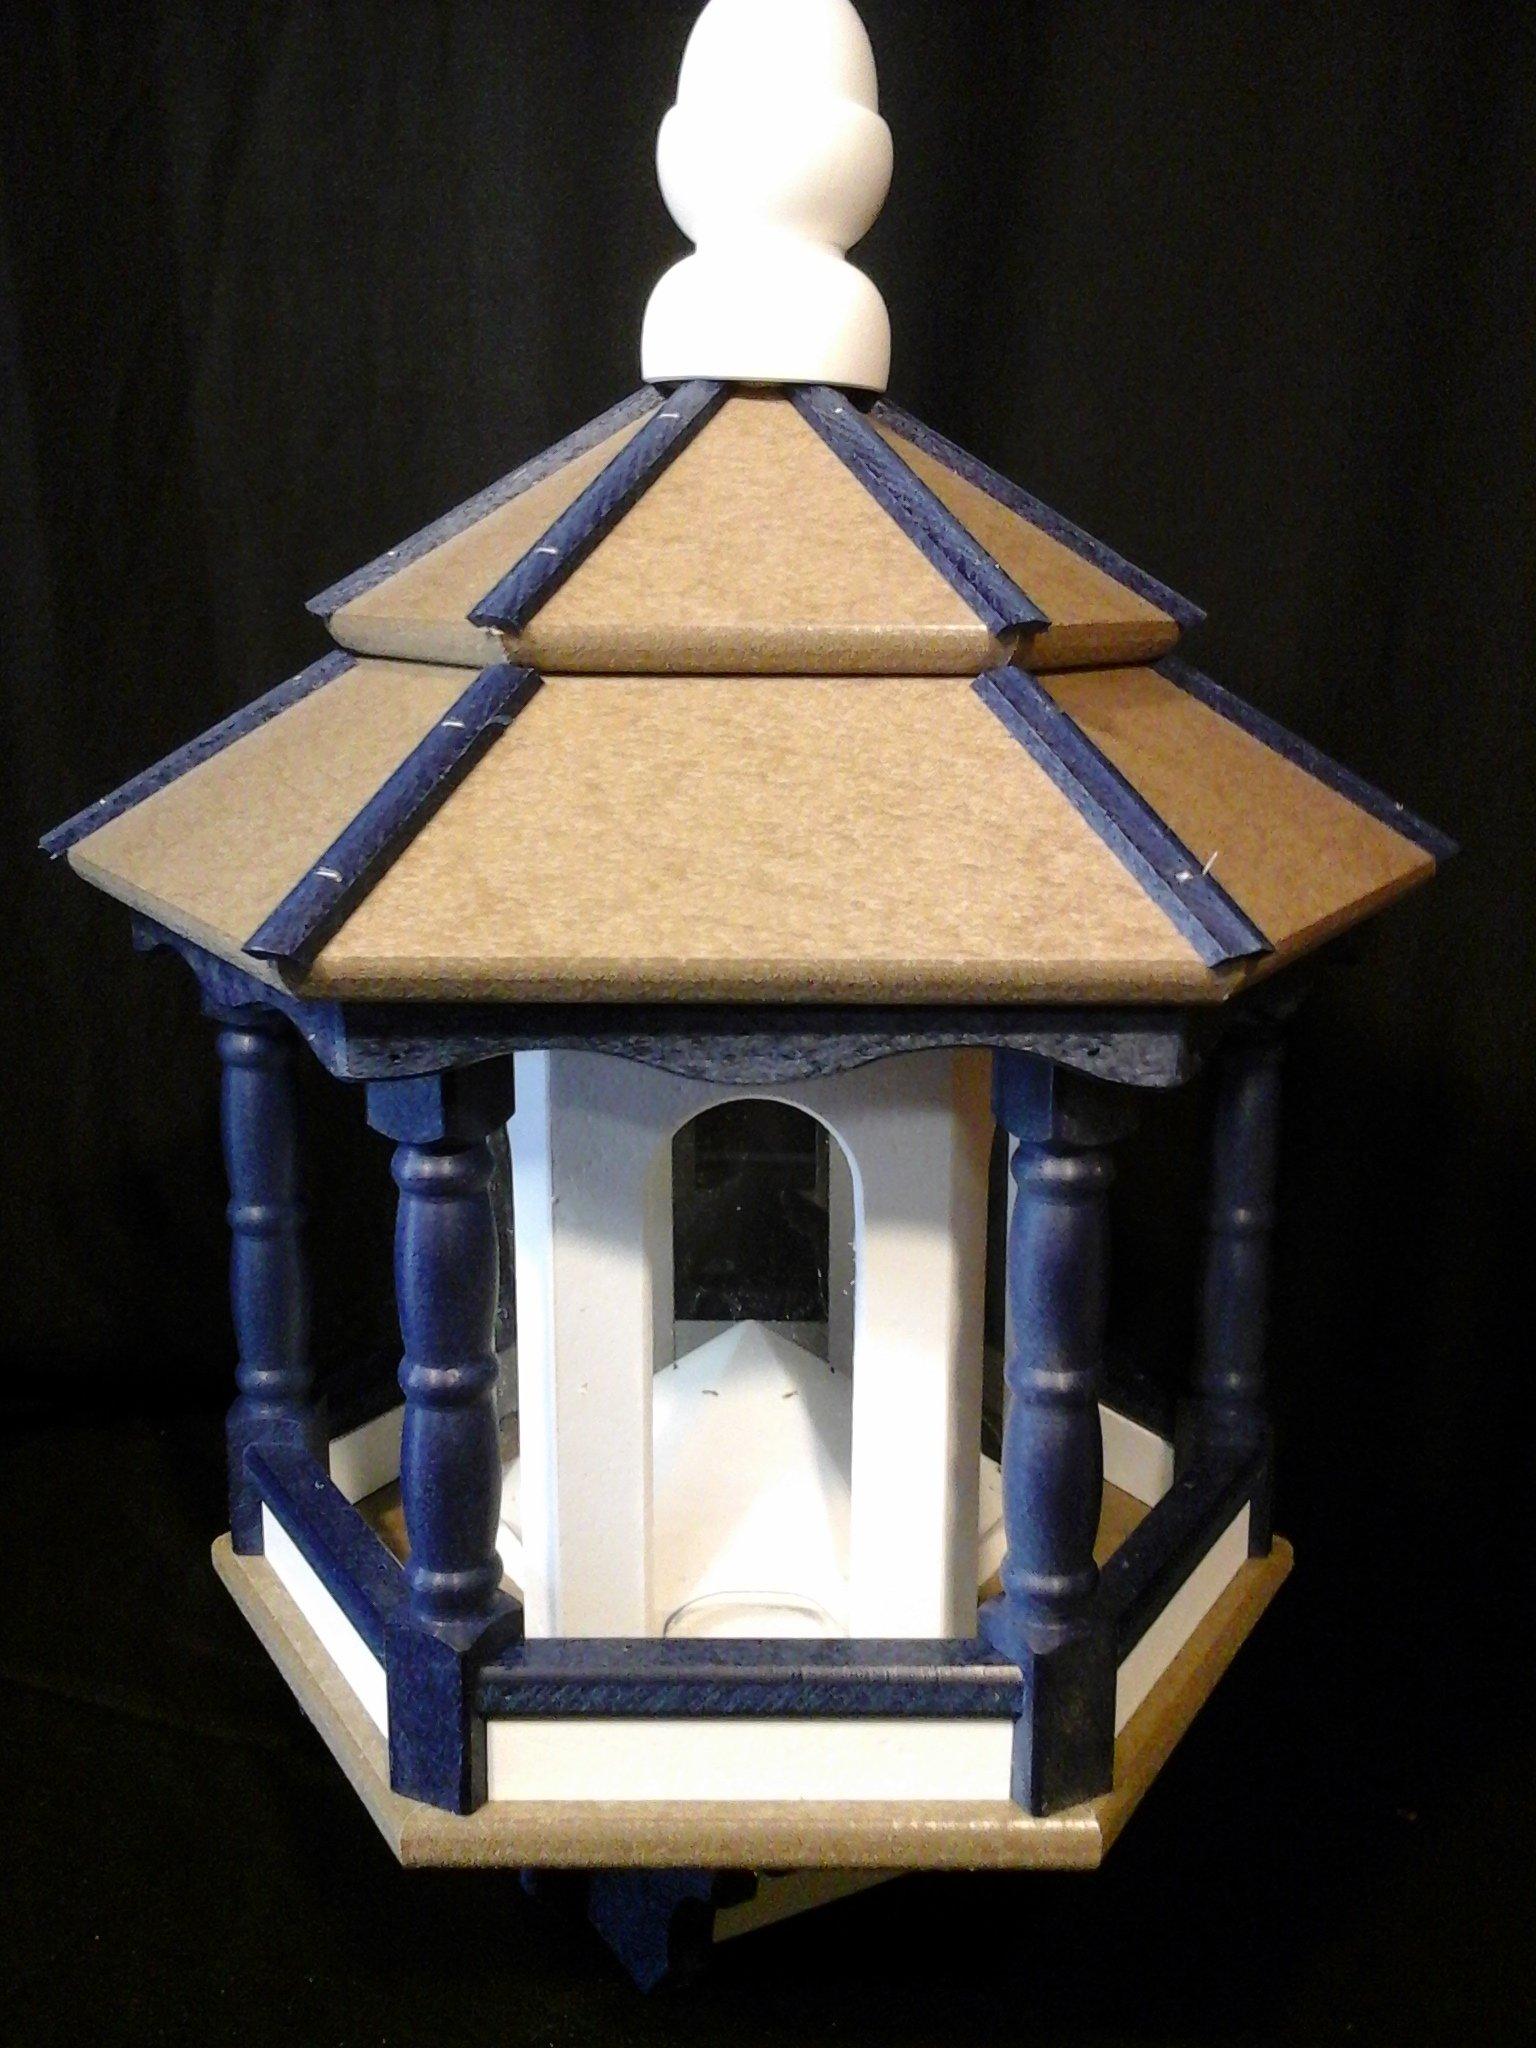 Vinyl Bird Feeder Amish Homemade Handmade Handcrafted Weatherwood, Blue, White